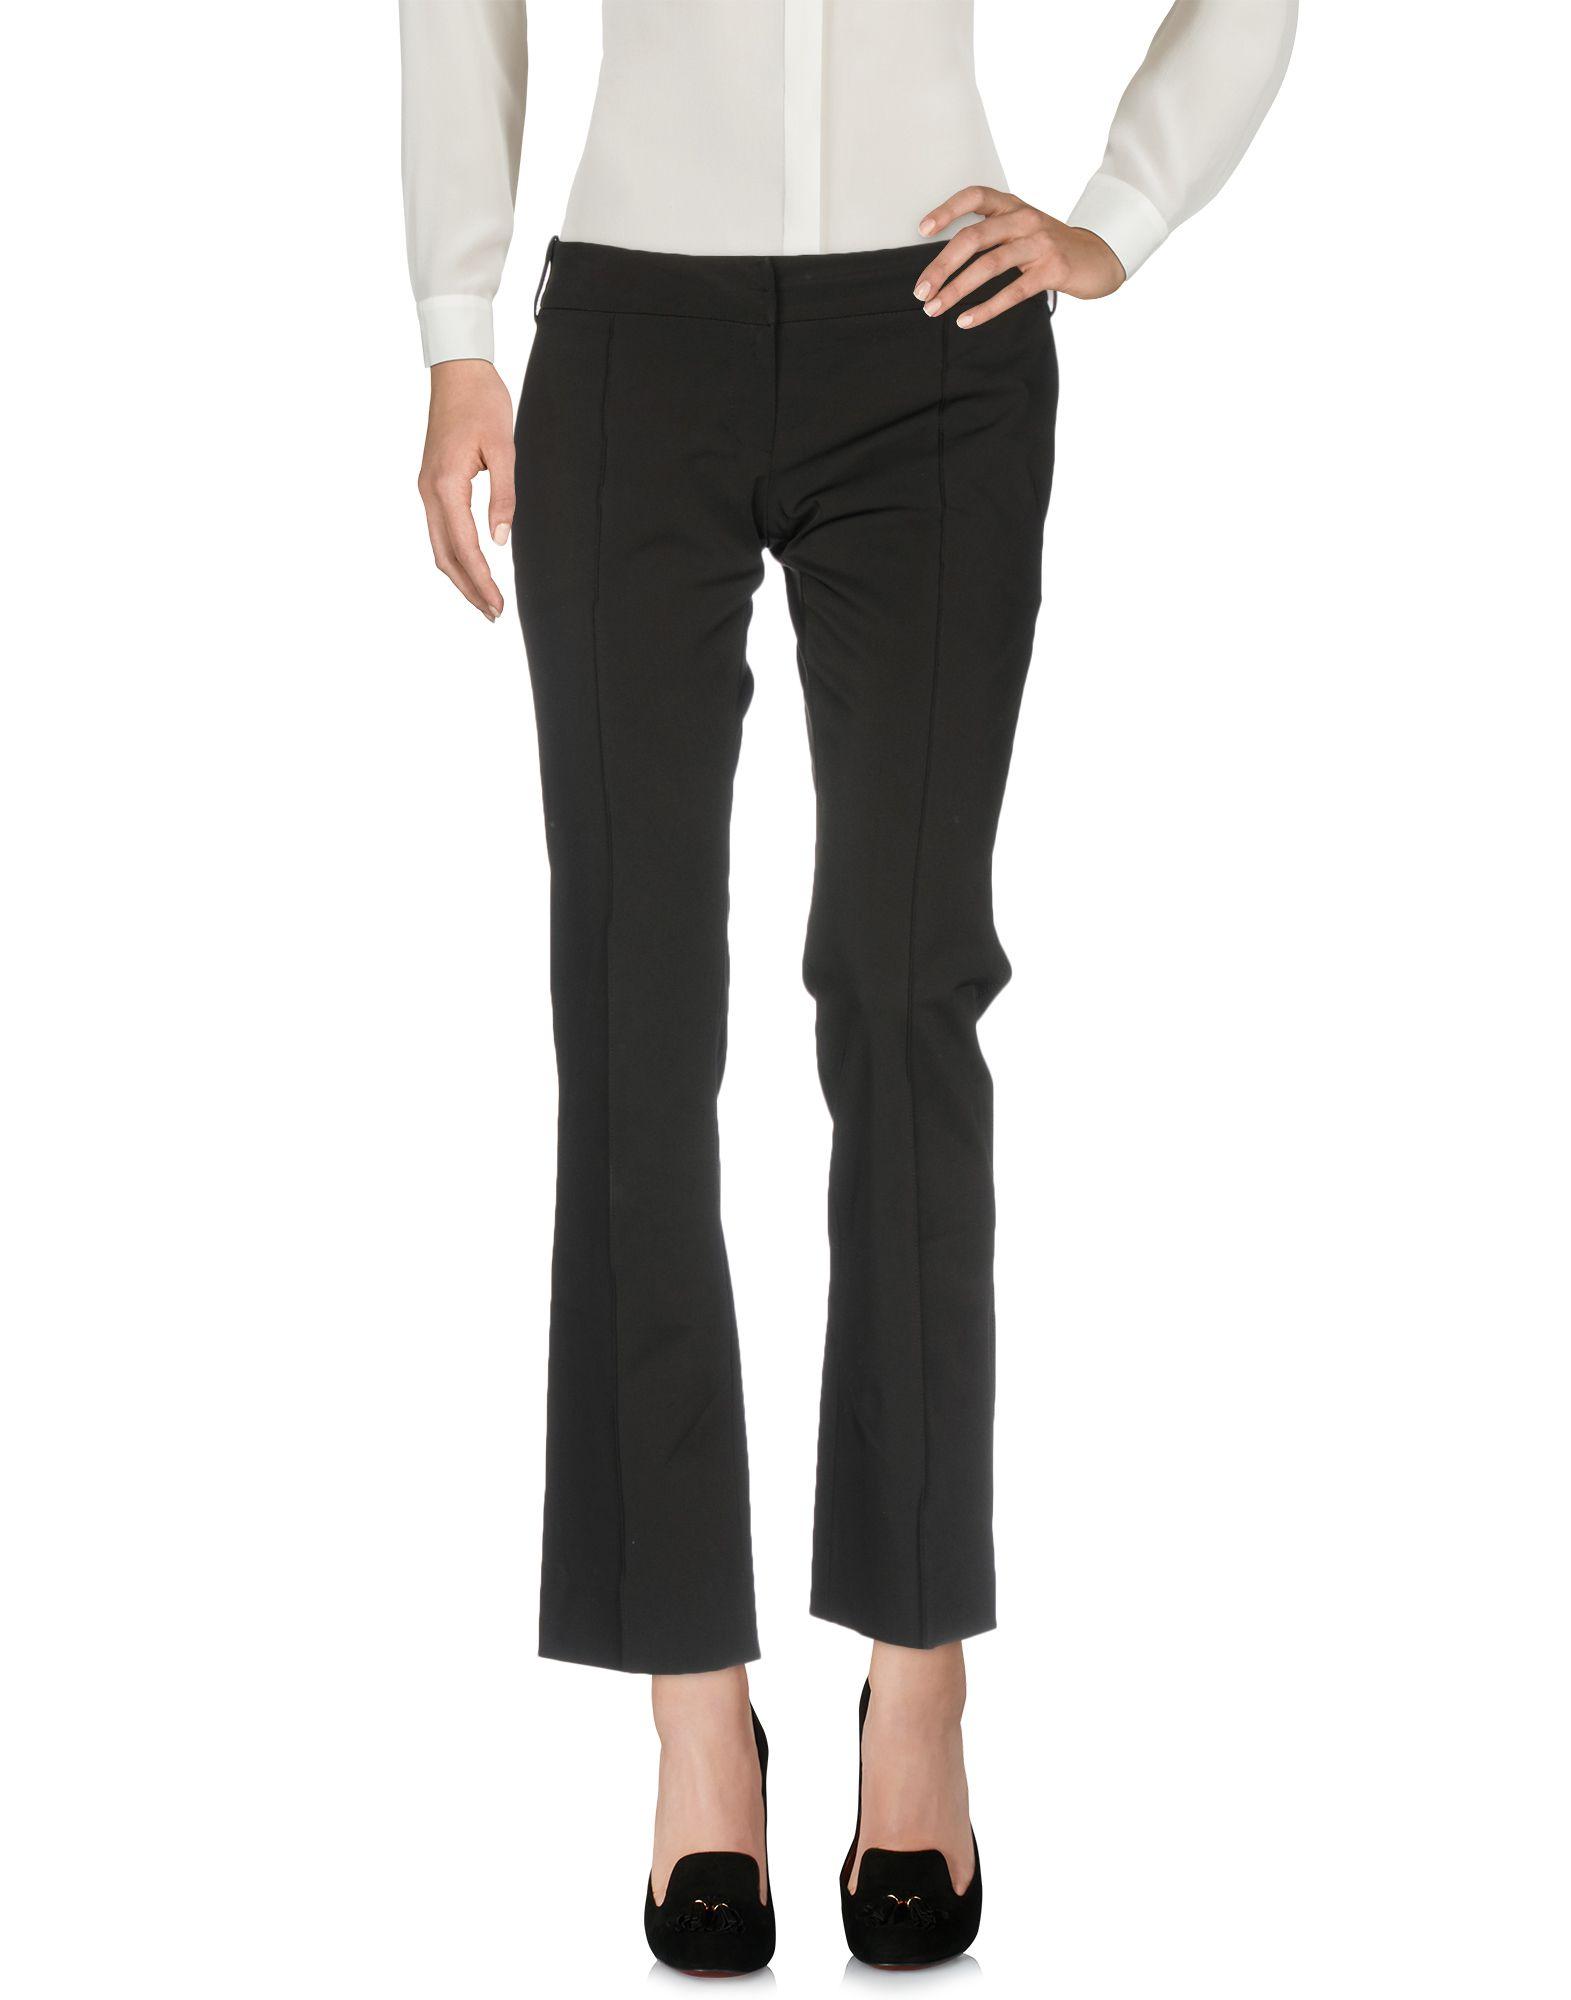 Pantalone Elisabetta Franchi For Celyn B. Donna - Acquista online su IR4hBPhL6